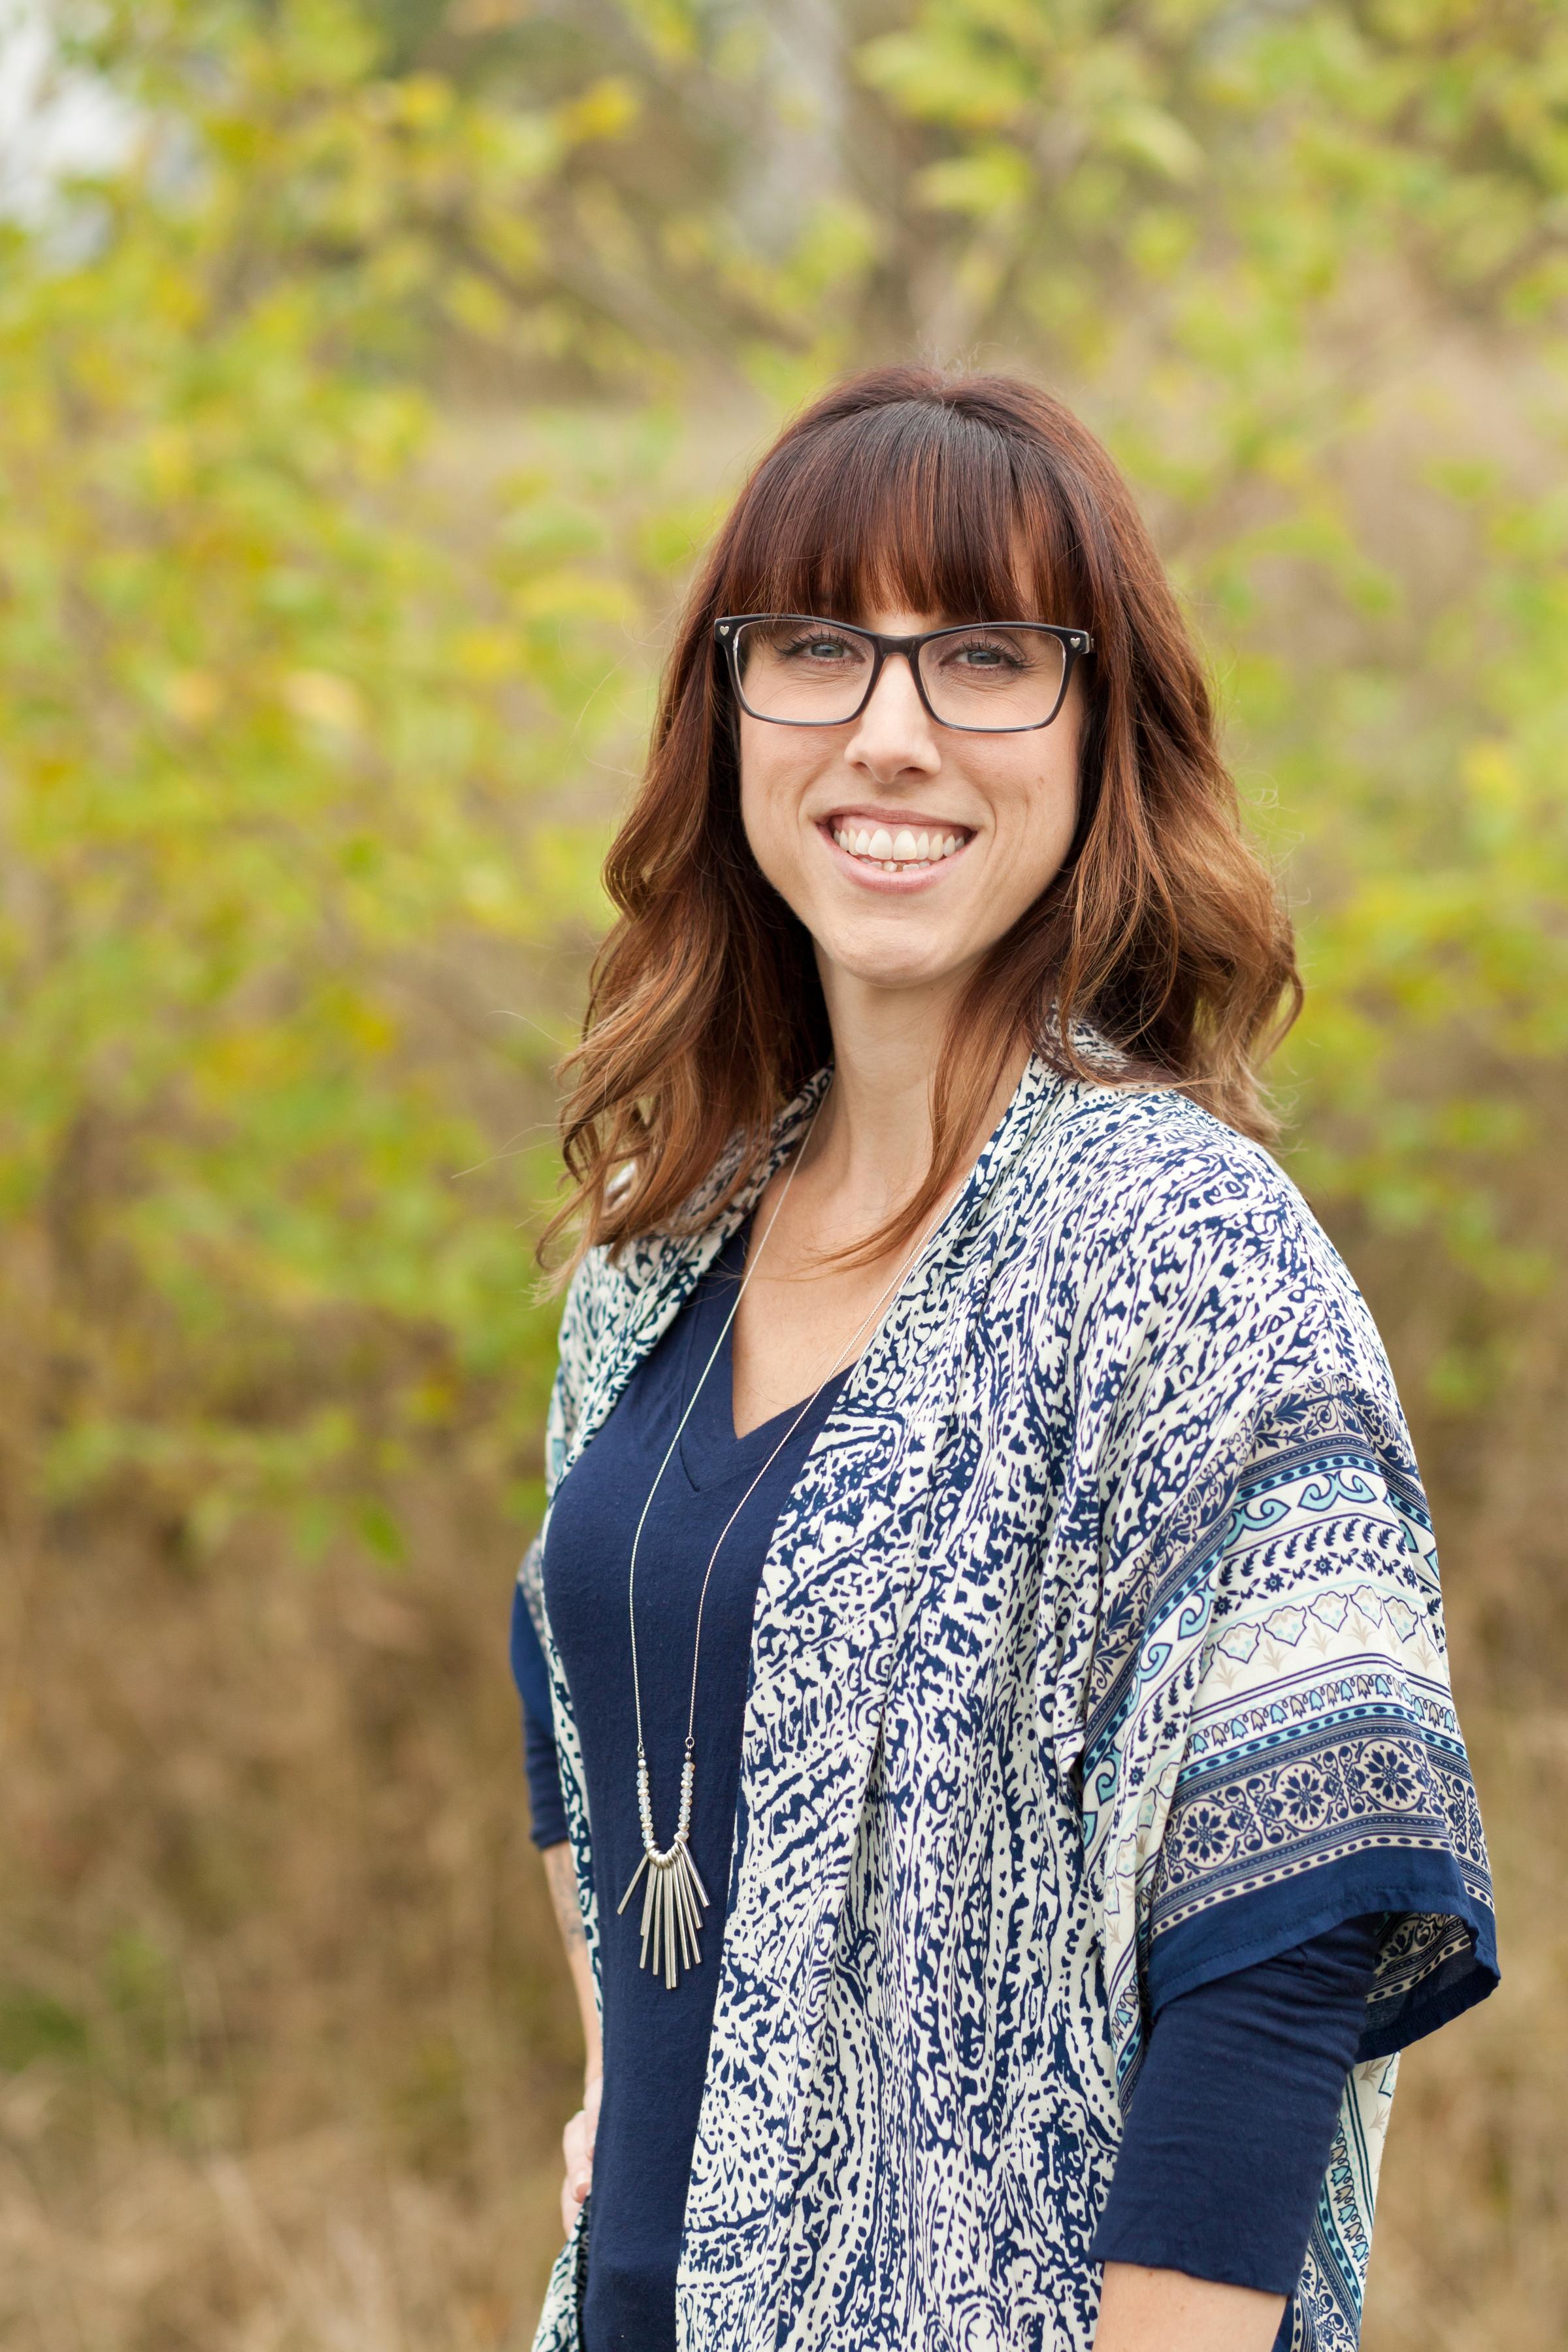 Chere Jewitt - LightHouse Children's Pastor   Chere@GracePointNW.org